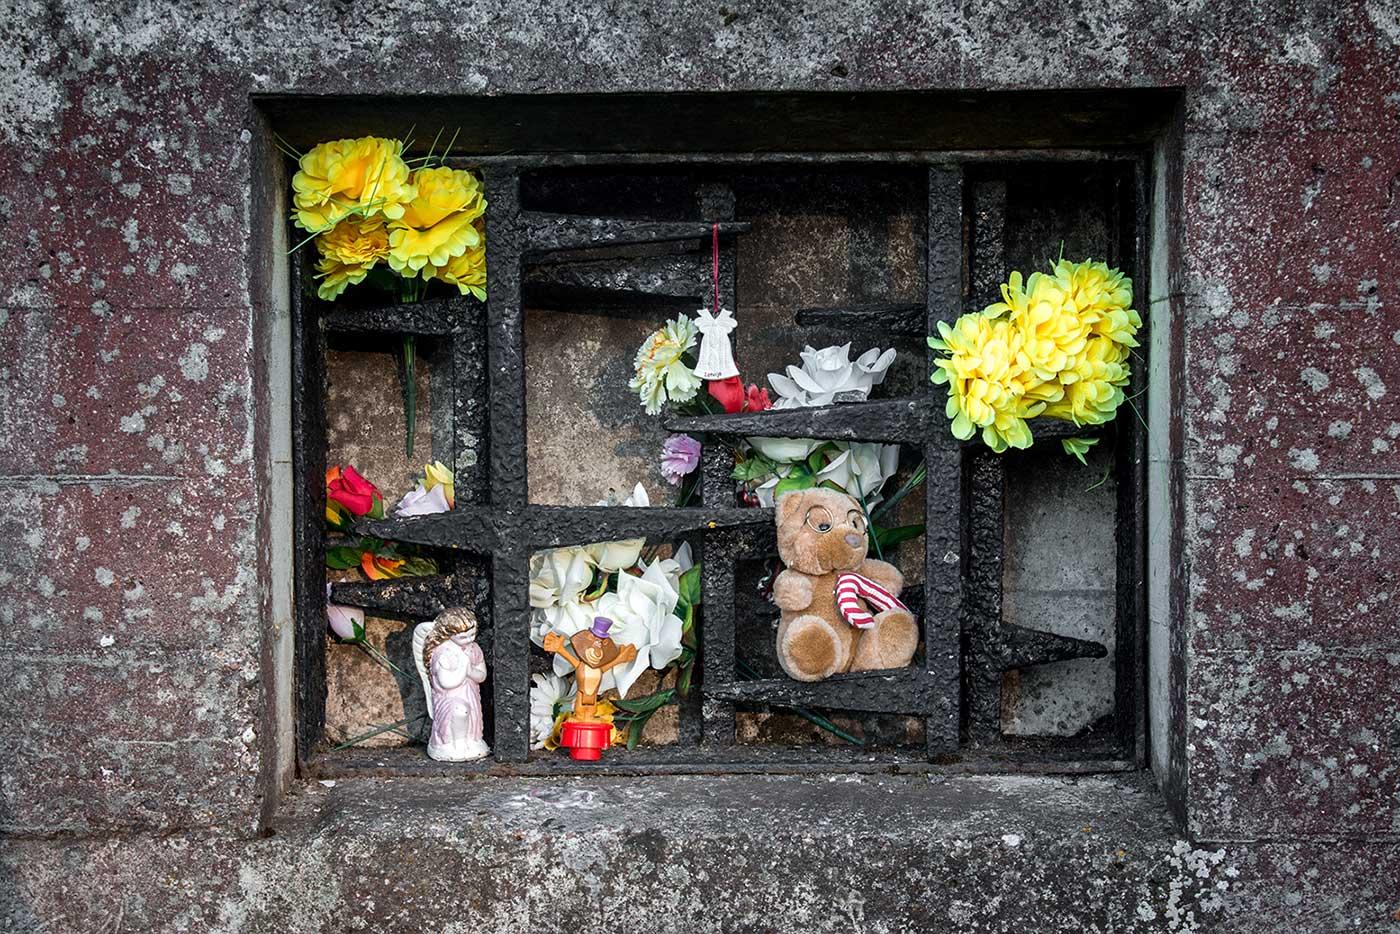 Tributes left by visitors. Salaspils Memorial, Latvia.